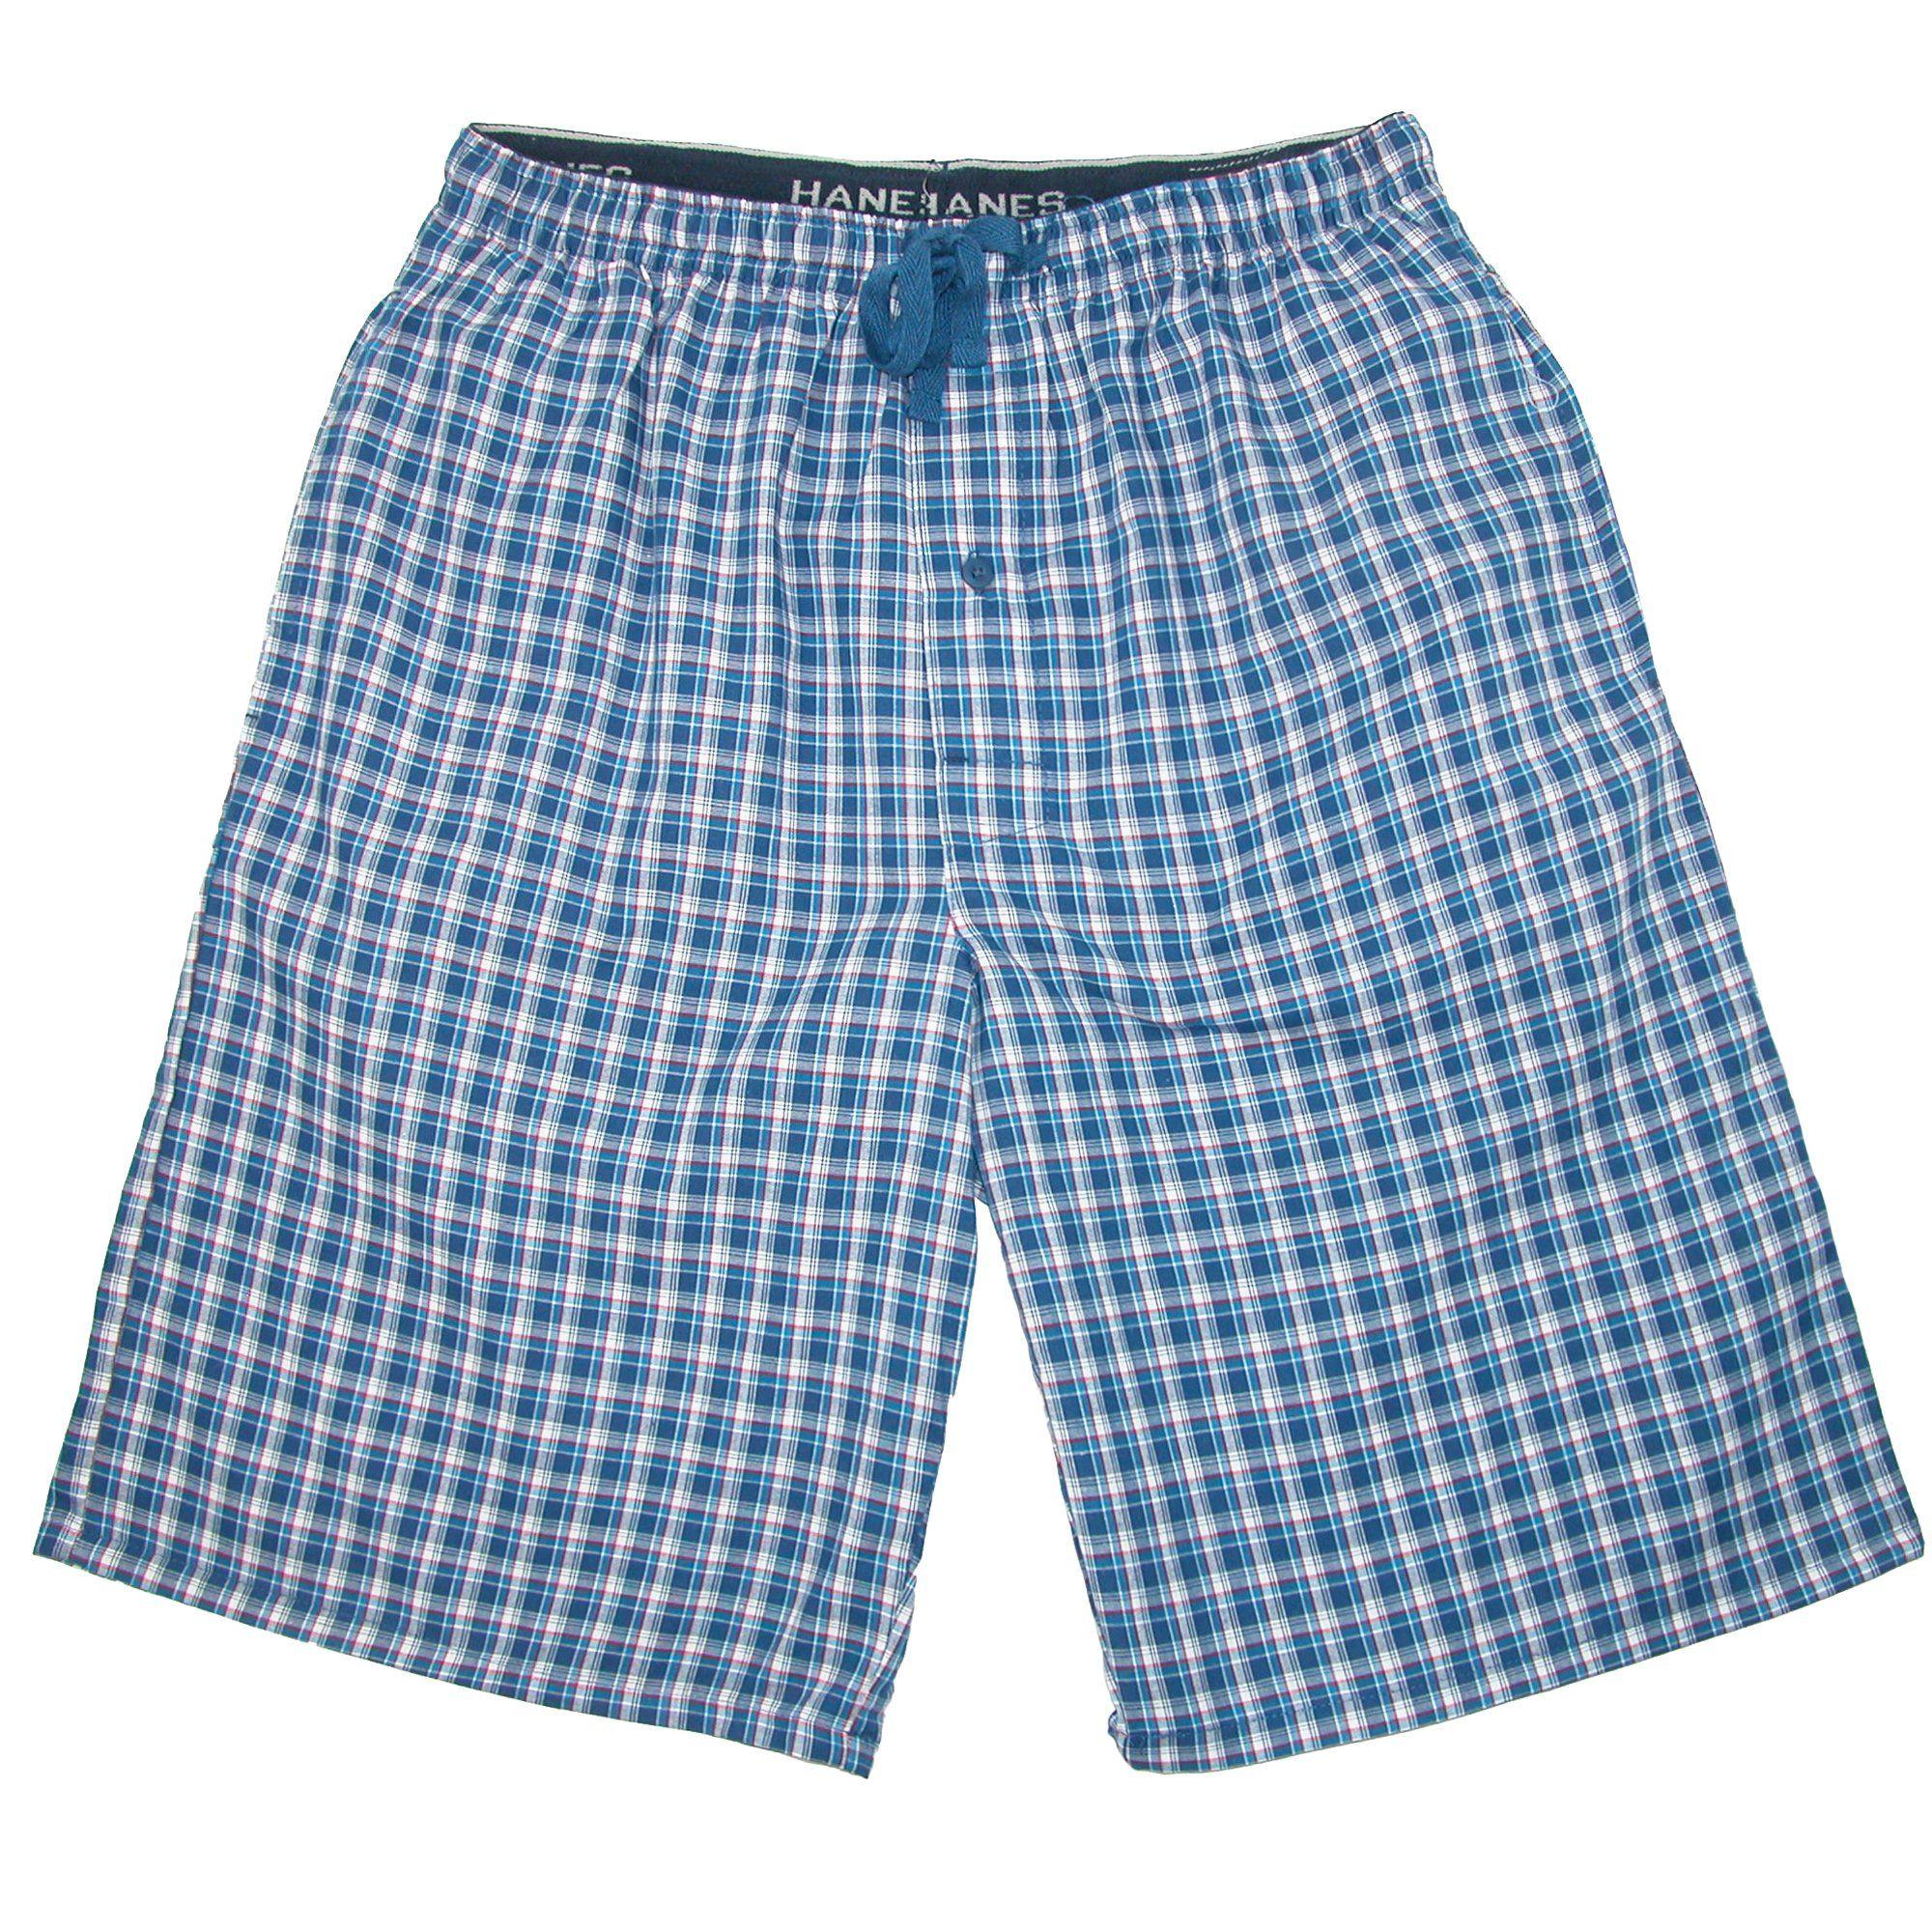 Latuza Mens Pyjamas Bottom Shorts